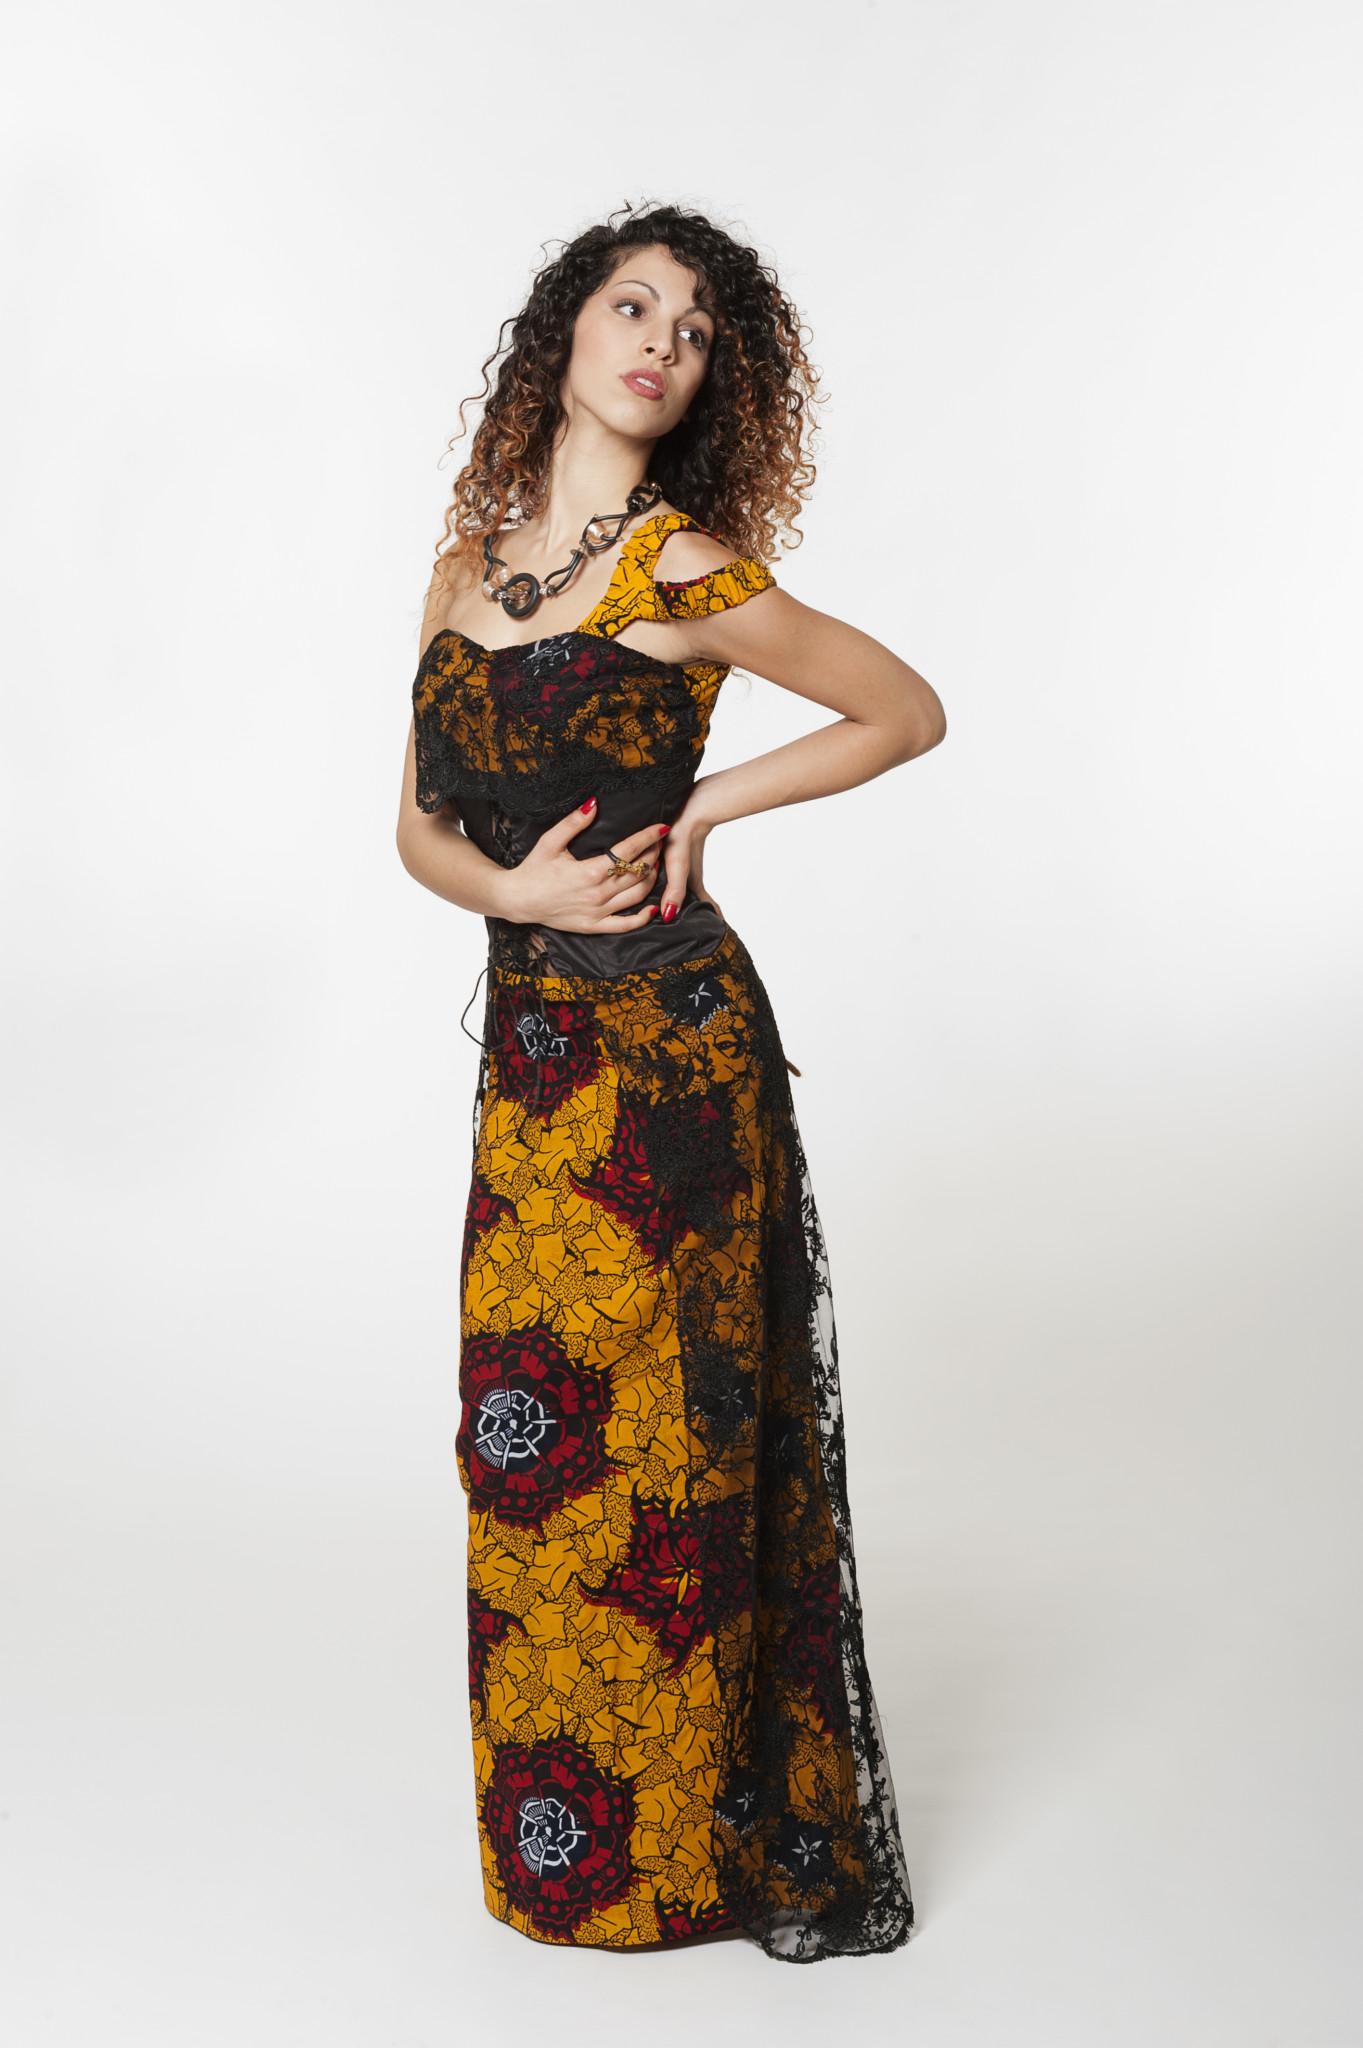 Model Frida